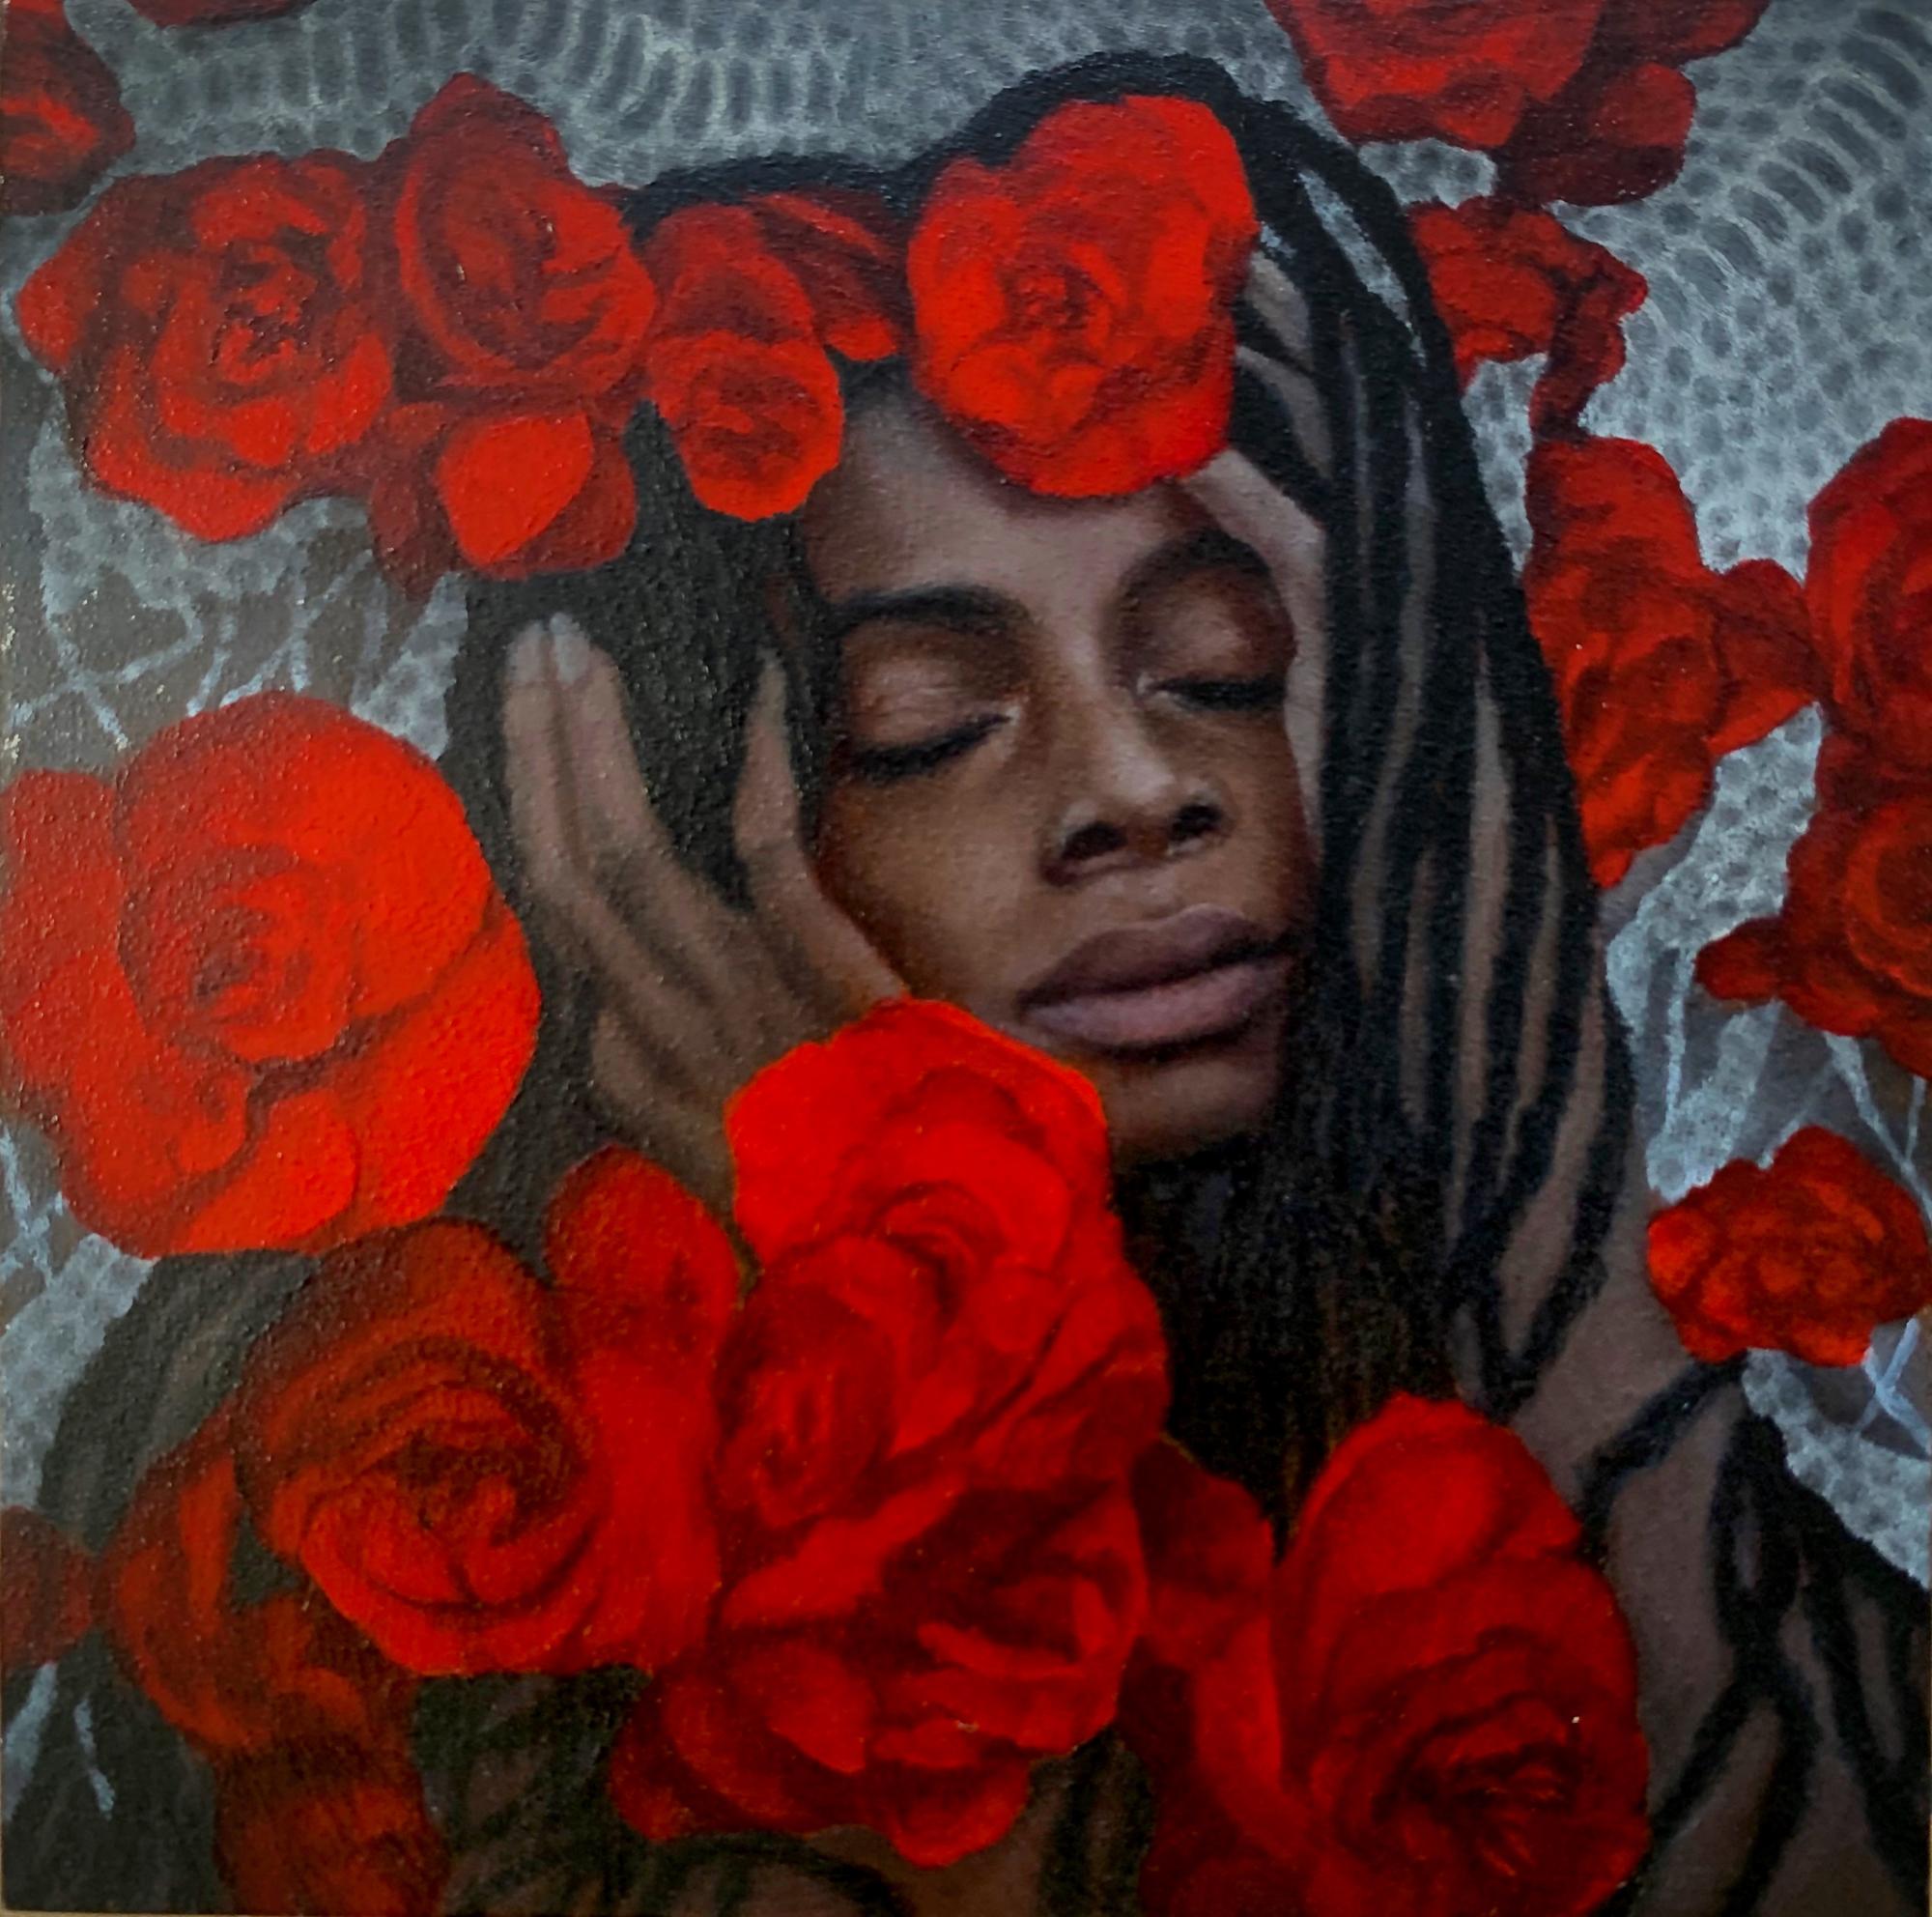 Scarlet Begonias by Genevieve May